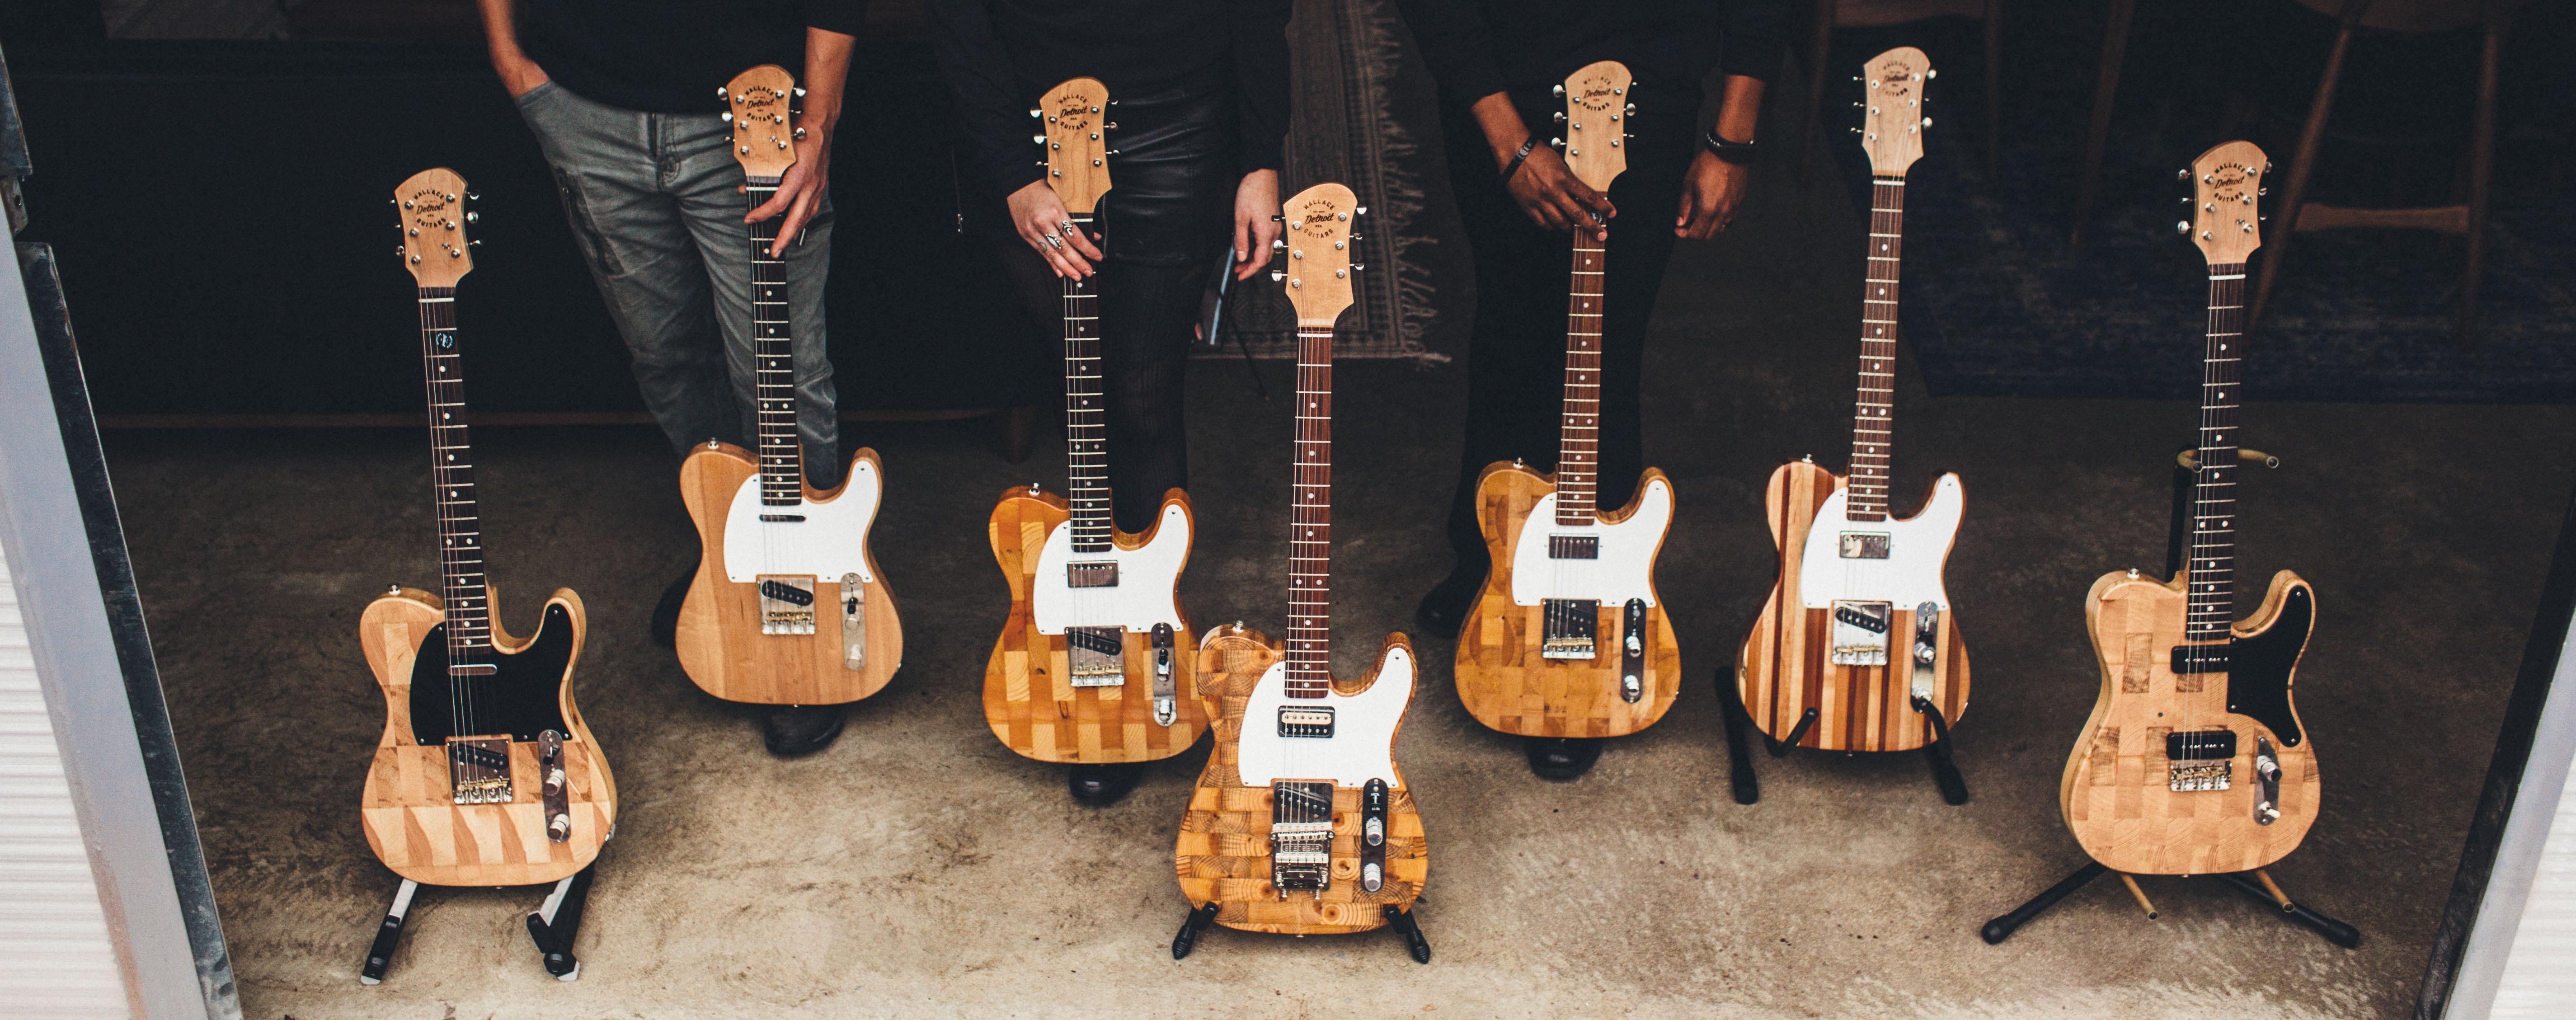 Wallace_Guitars_013 thumb crop